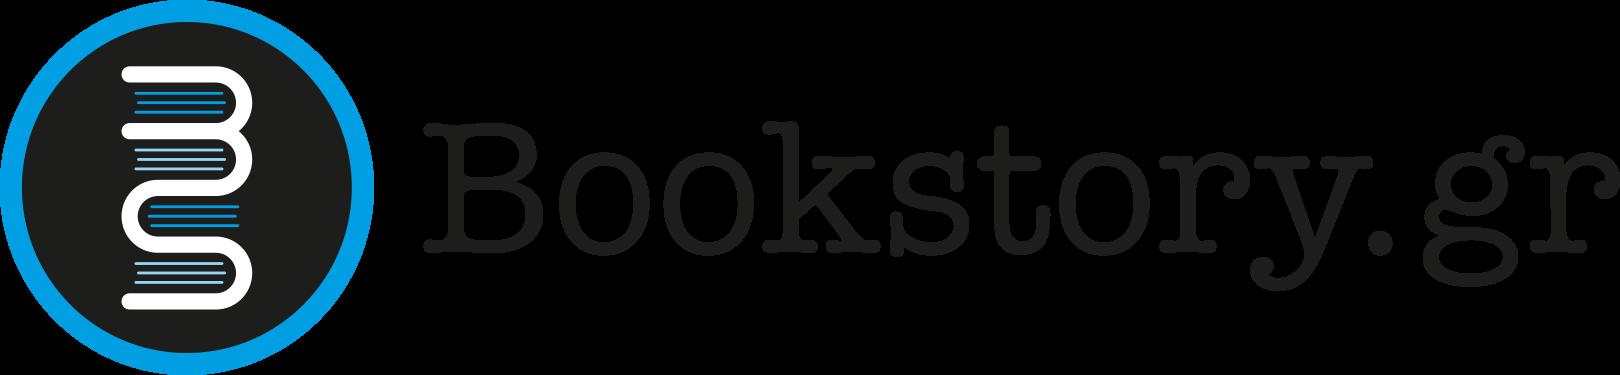 Bookstory.gr